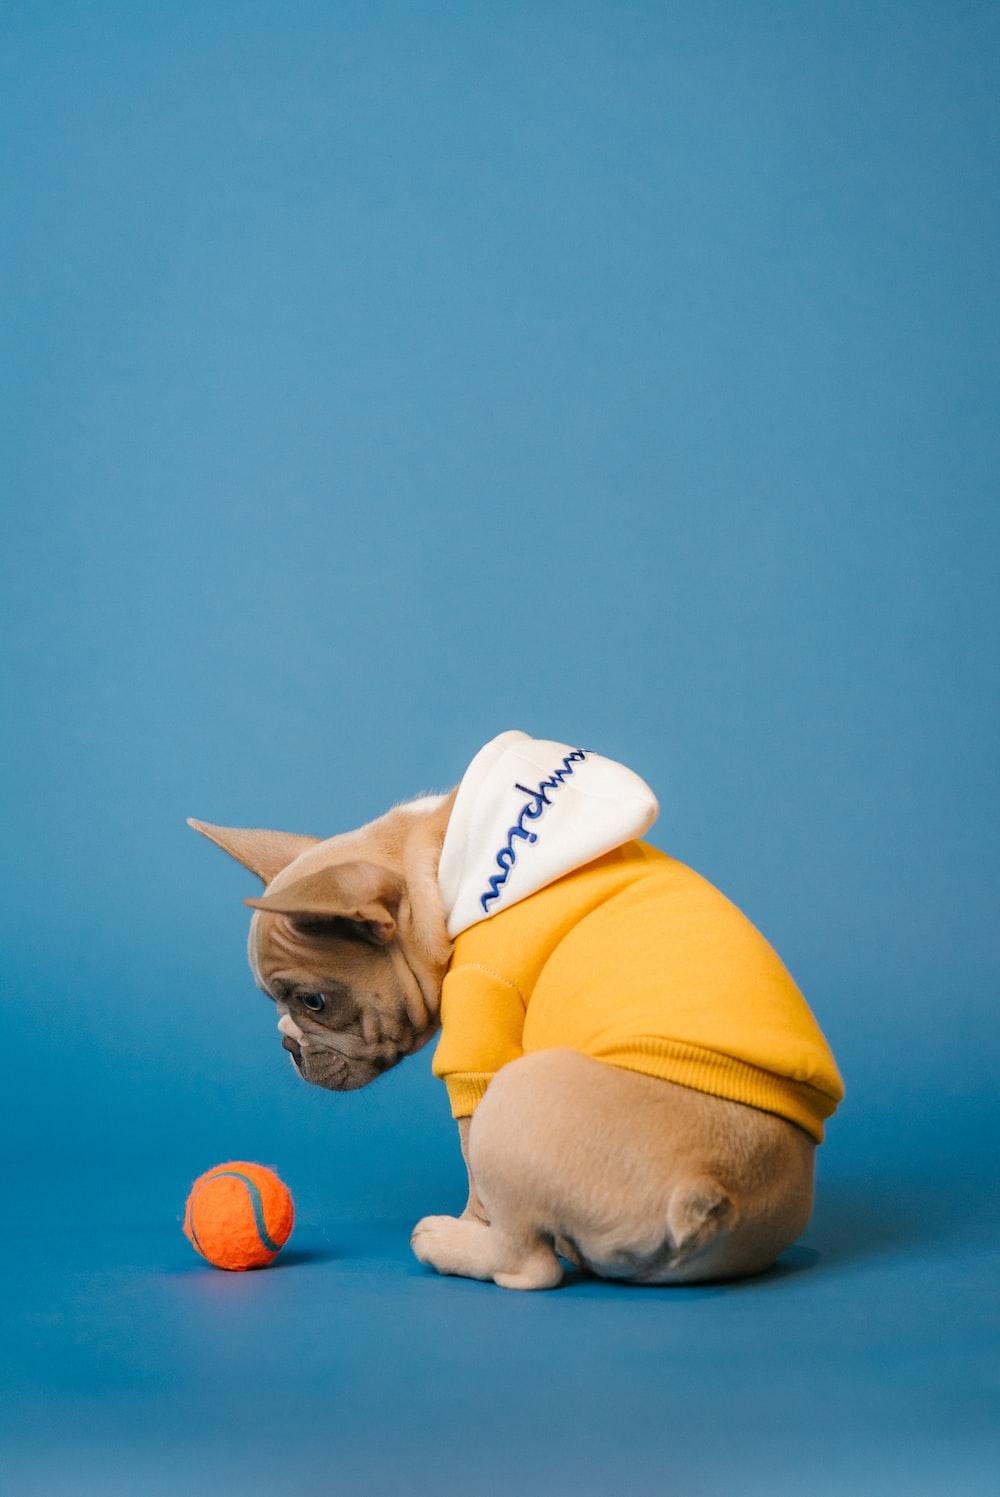 fawn pug wearing yellow hat